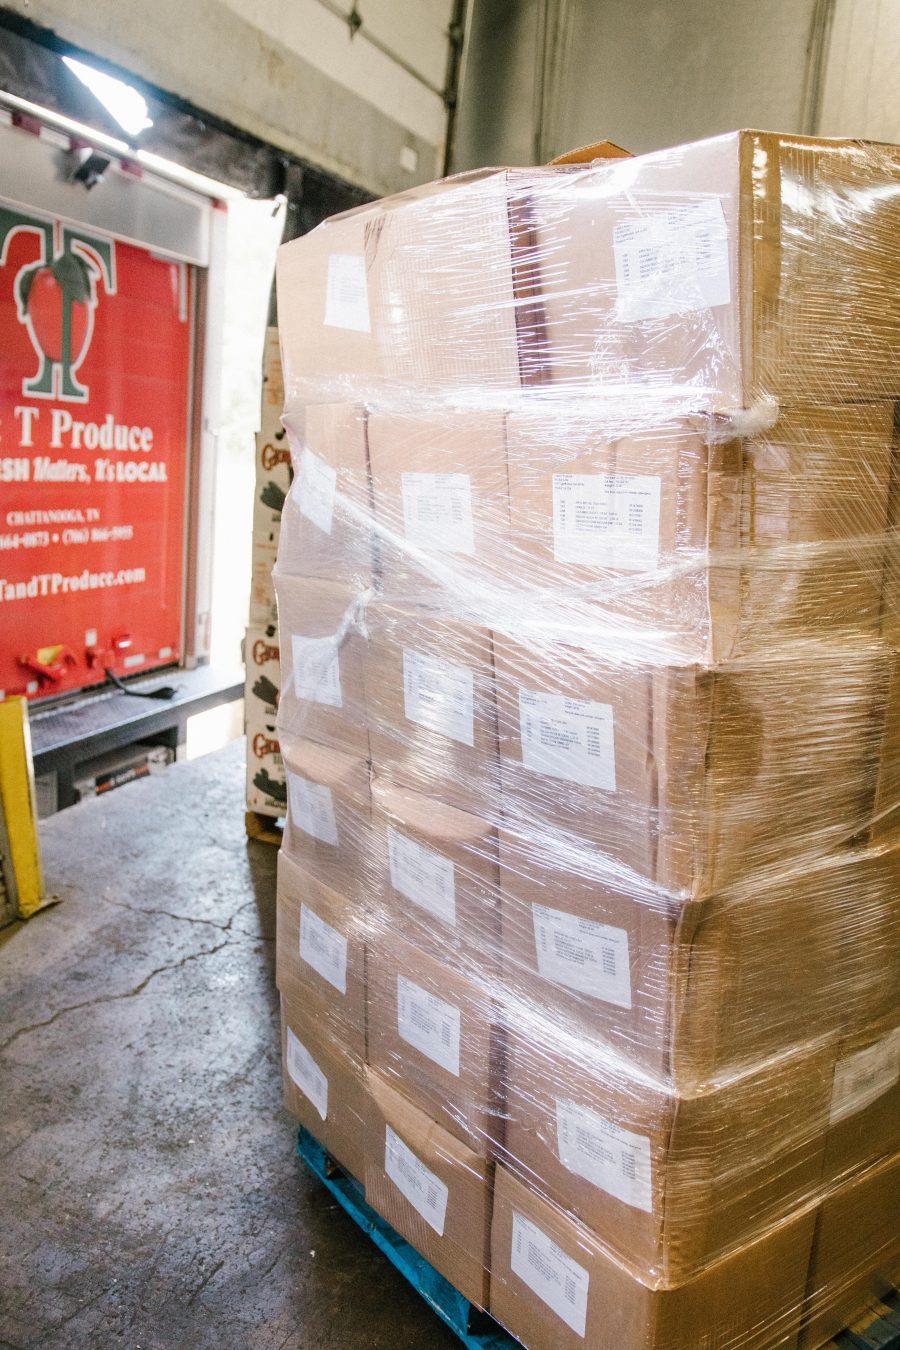 PRESS RELEASE: USDA FOOD BOX PROGRAM